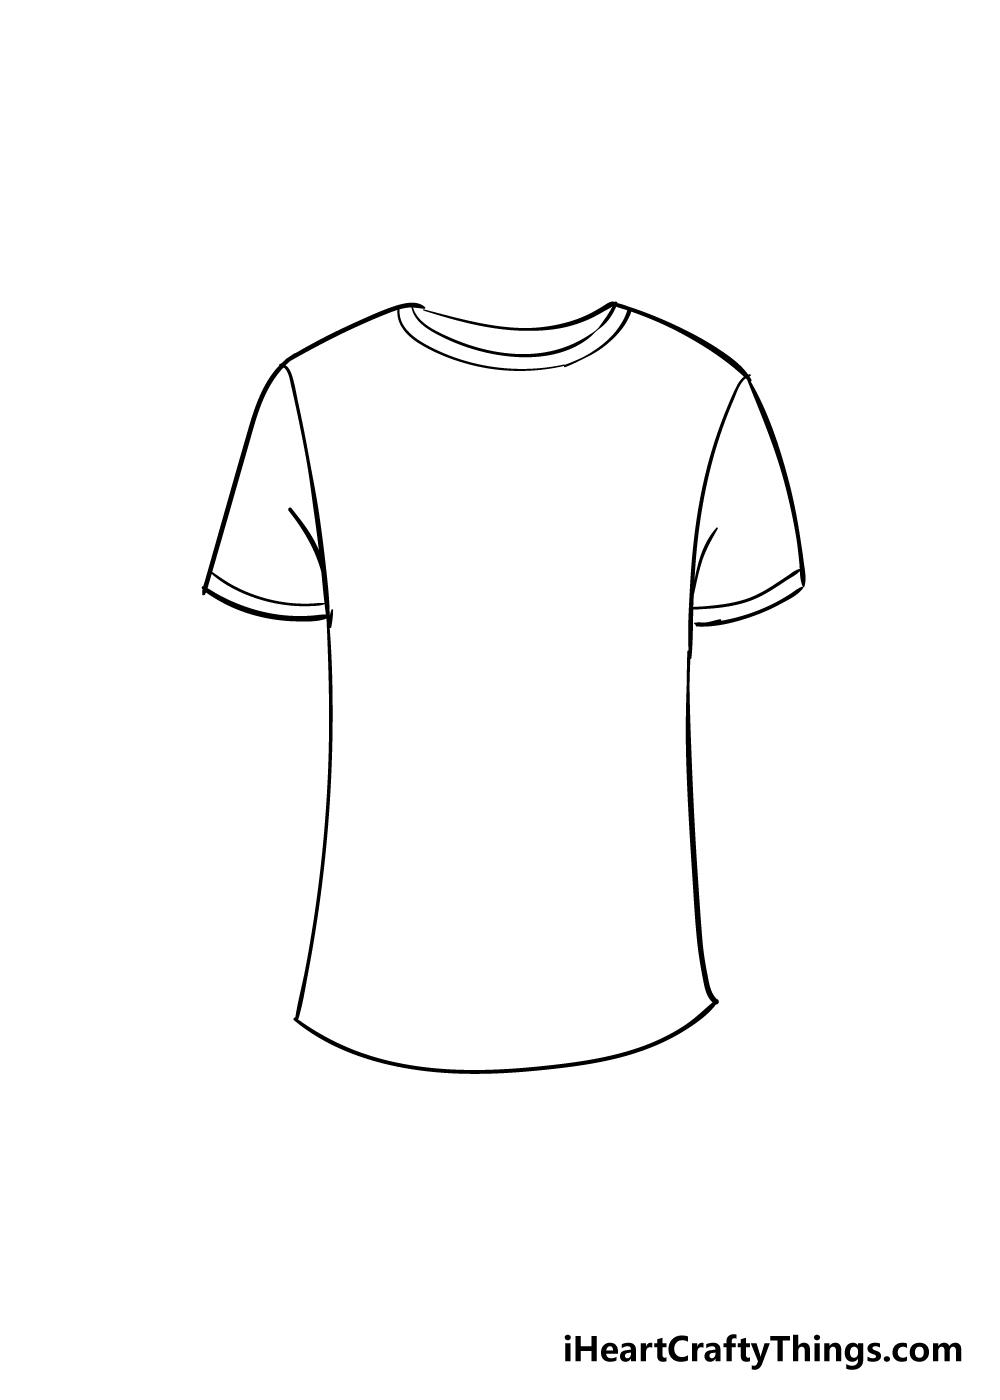 shirt drawing step 5